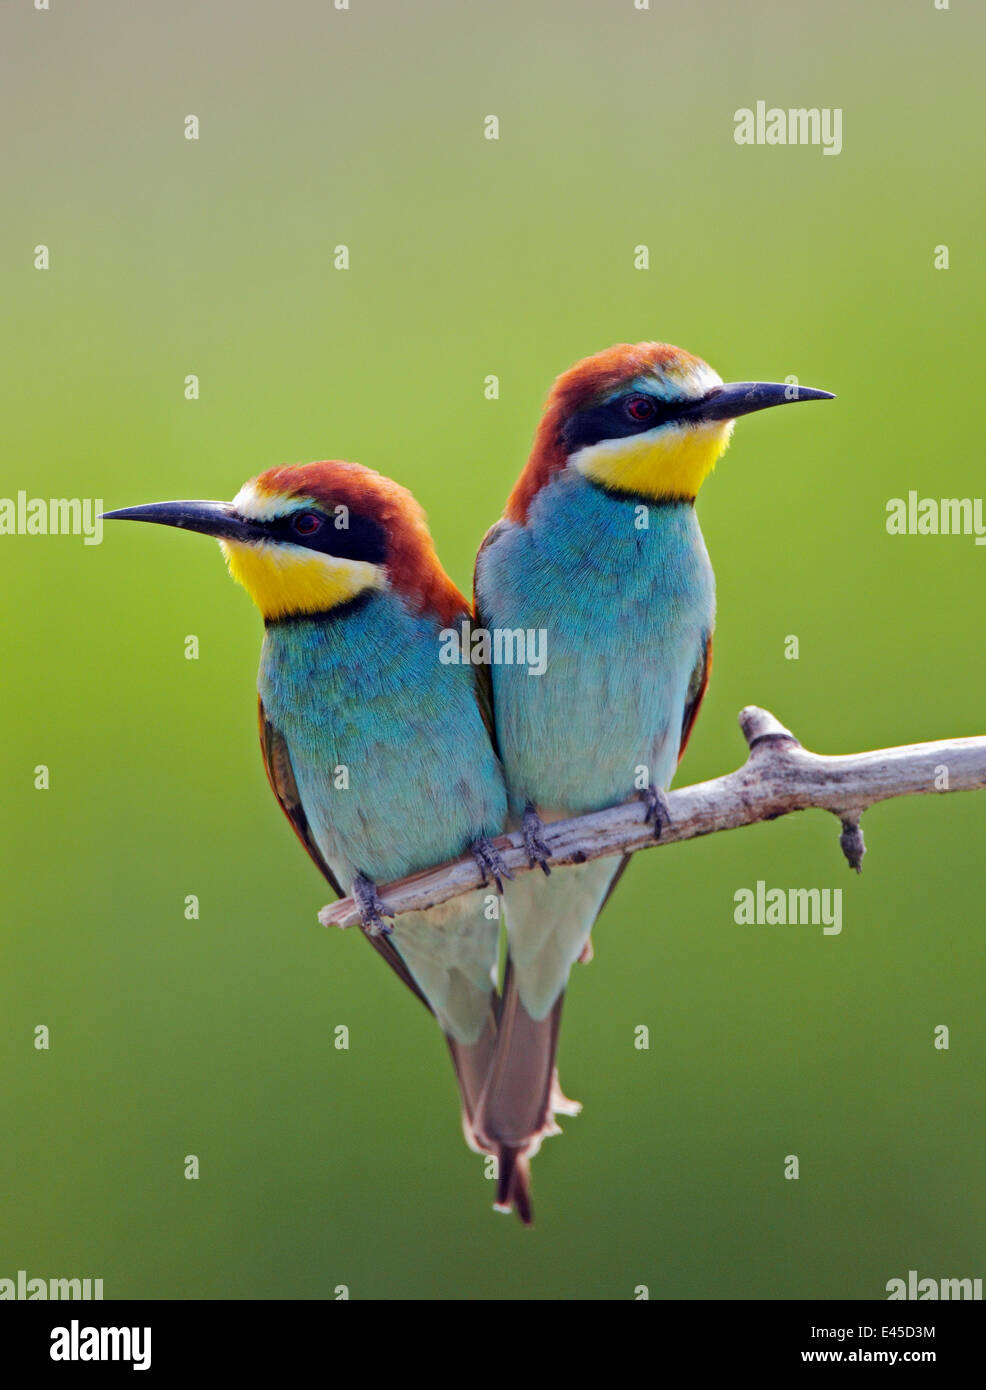 European Bee-eater (Merops apiaster) pair perched, Pusztaszer, Hungary, May 2008 - Stock Image